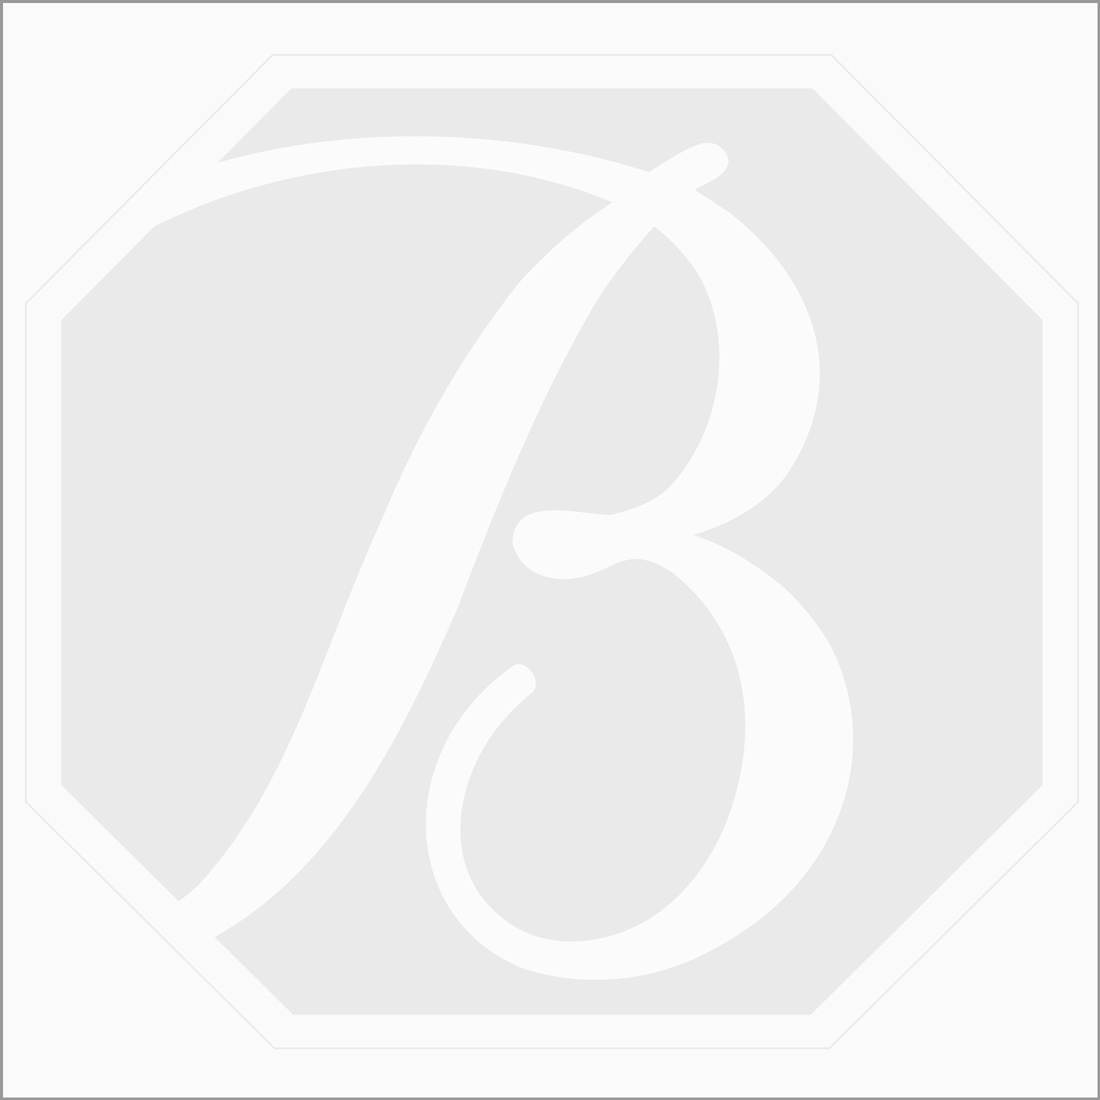 17.30 x 18.40 x 5.80 mm - Black Trillion Shaped Rose Cut Diamond  - 14.63 carats (FncyDiaRC1123)